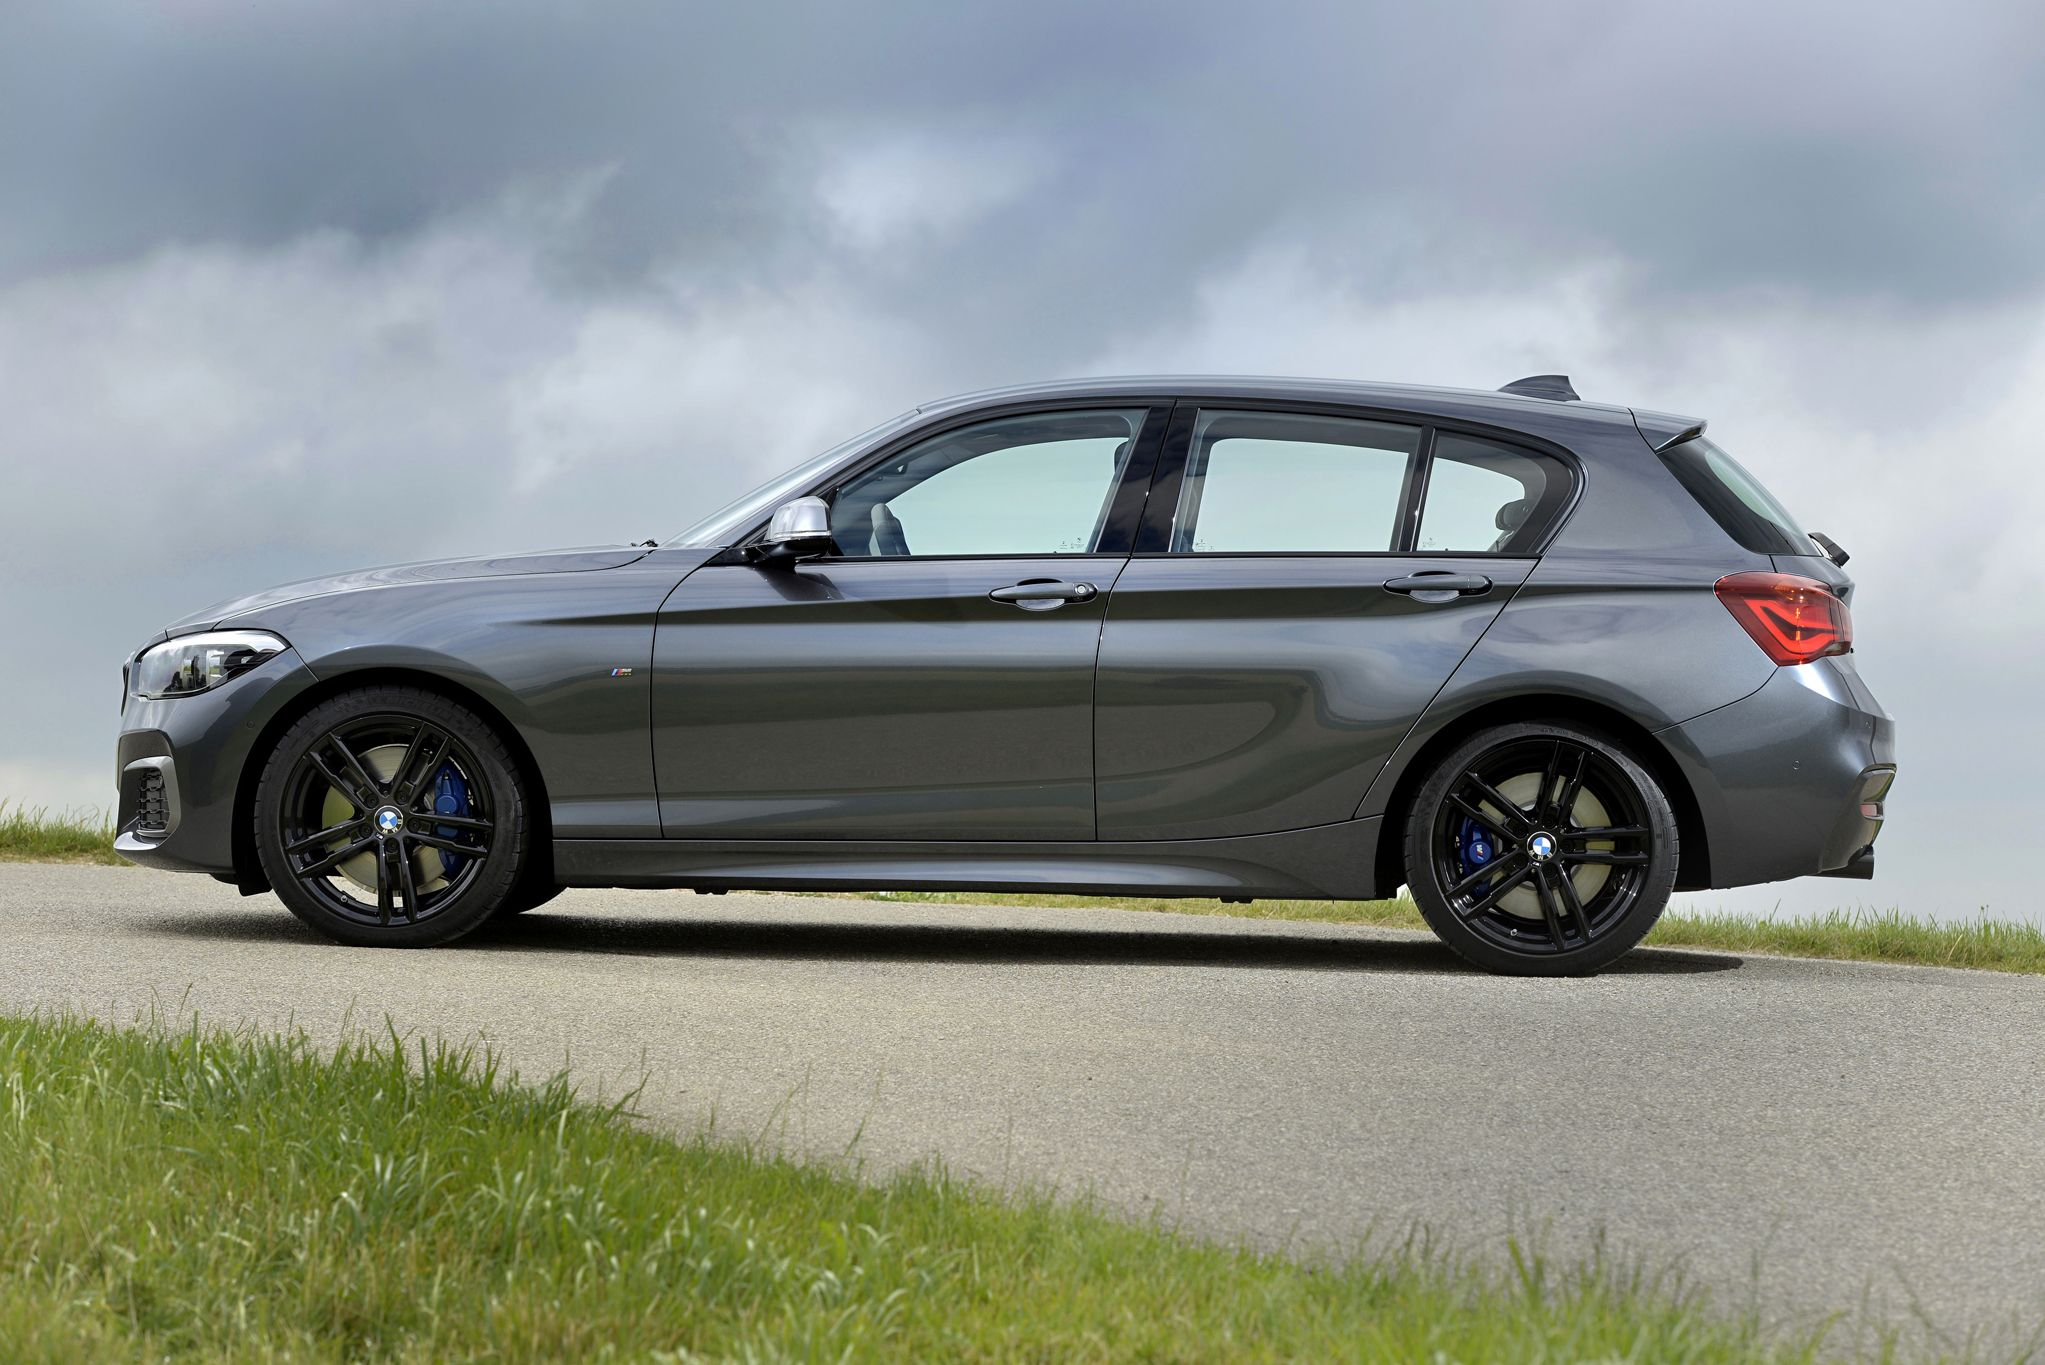 Bmw F20 M140i Hatchback Facelift Editionshadow Sportline